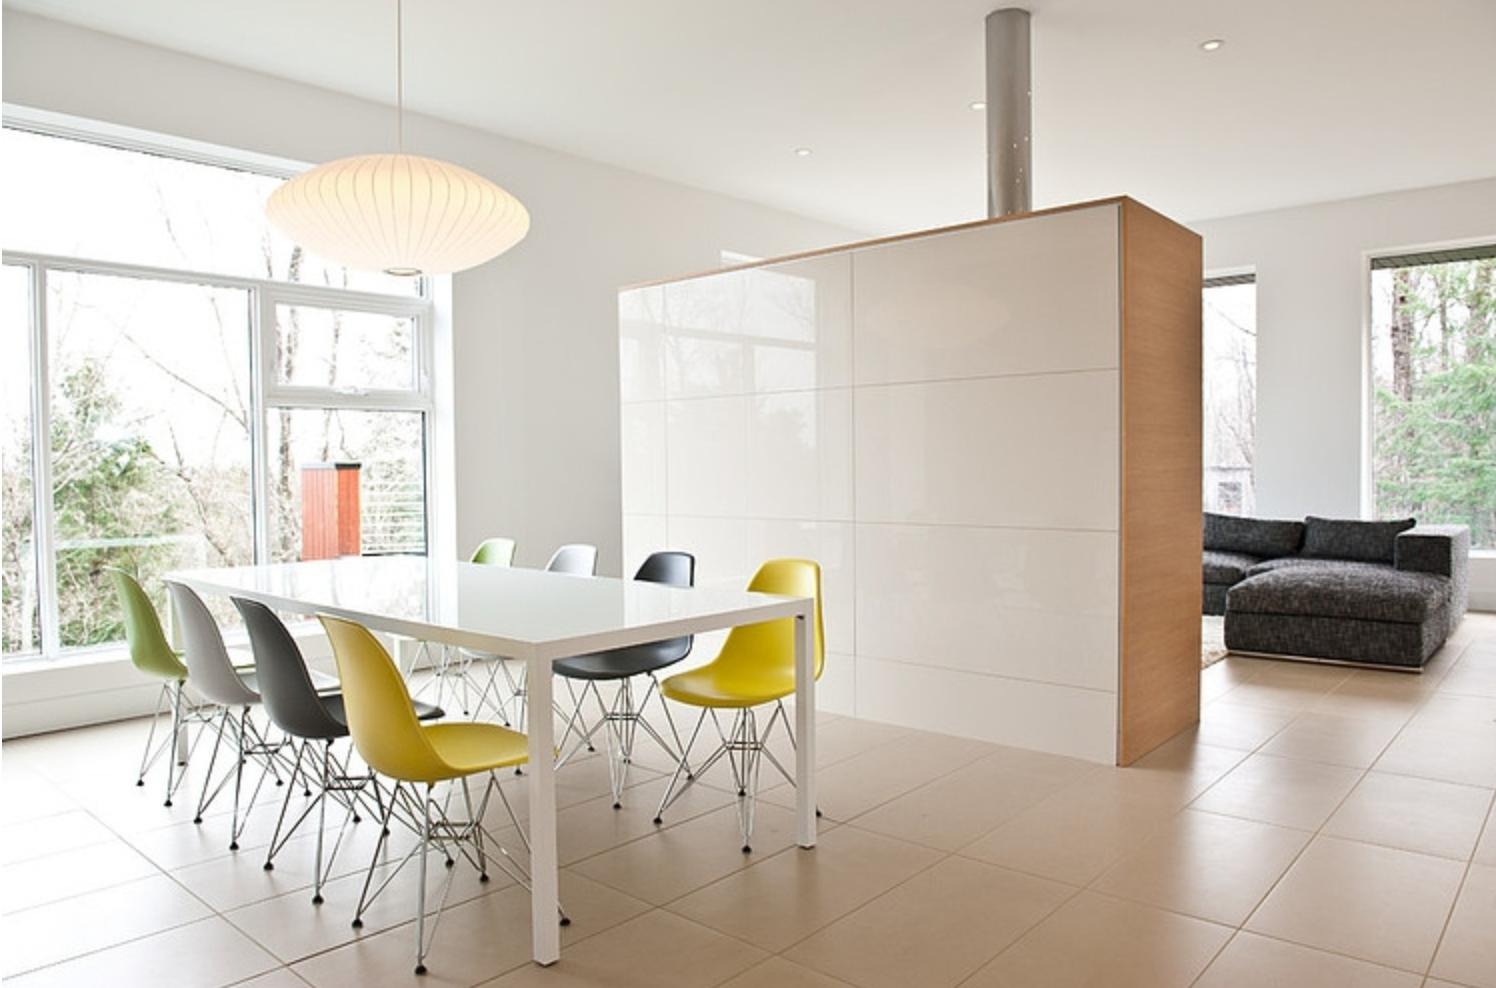 Scheidingswand eetkamer woonkamer vitra dining